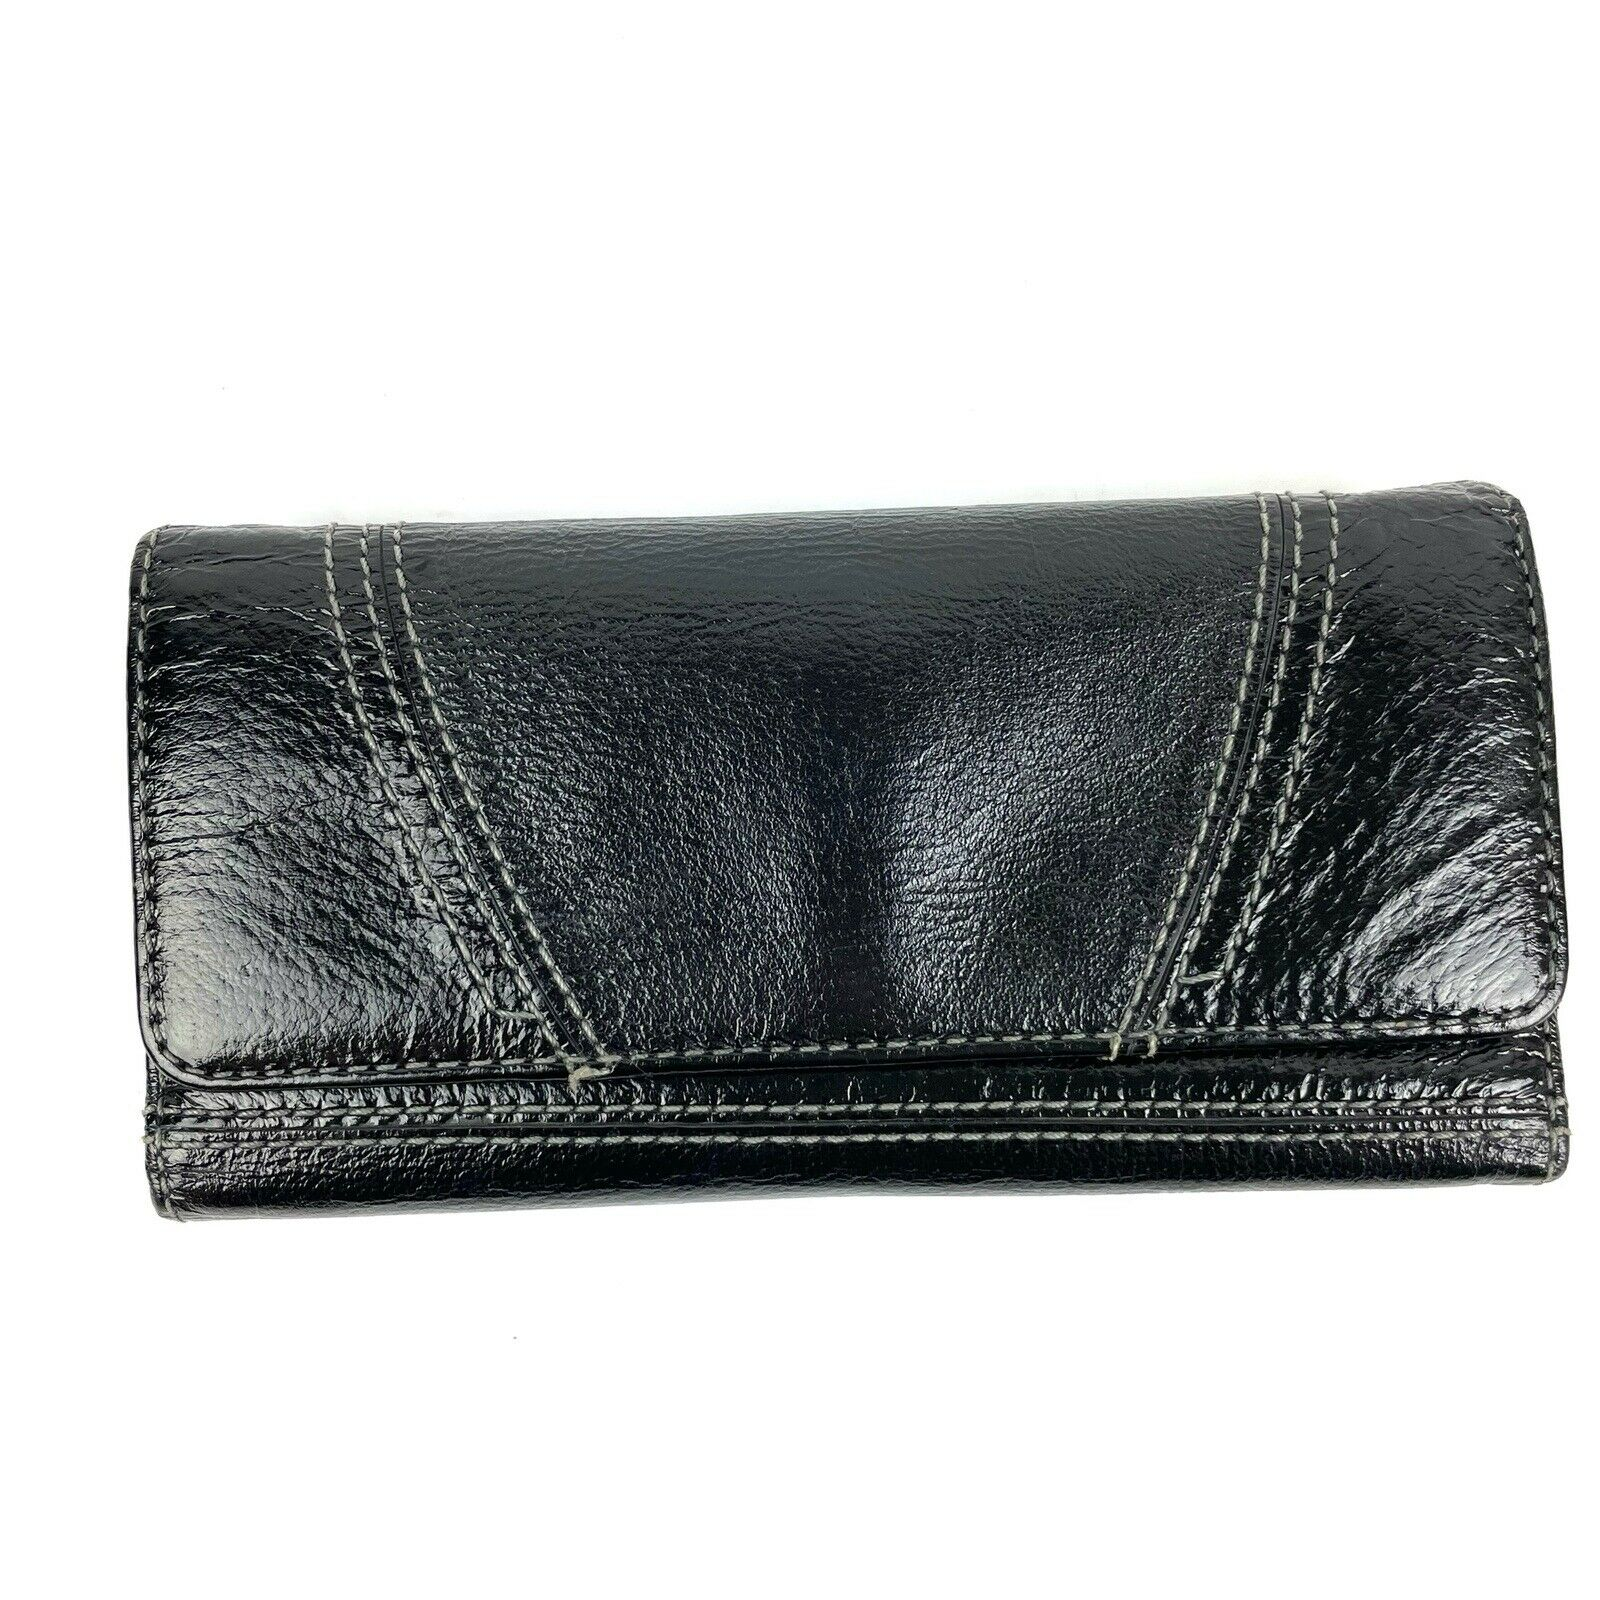 Hobo International Trifold Wallet Black Leather Snap Organizer Clutch READ